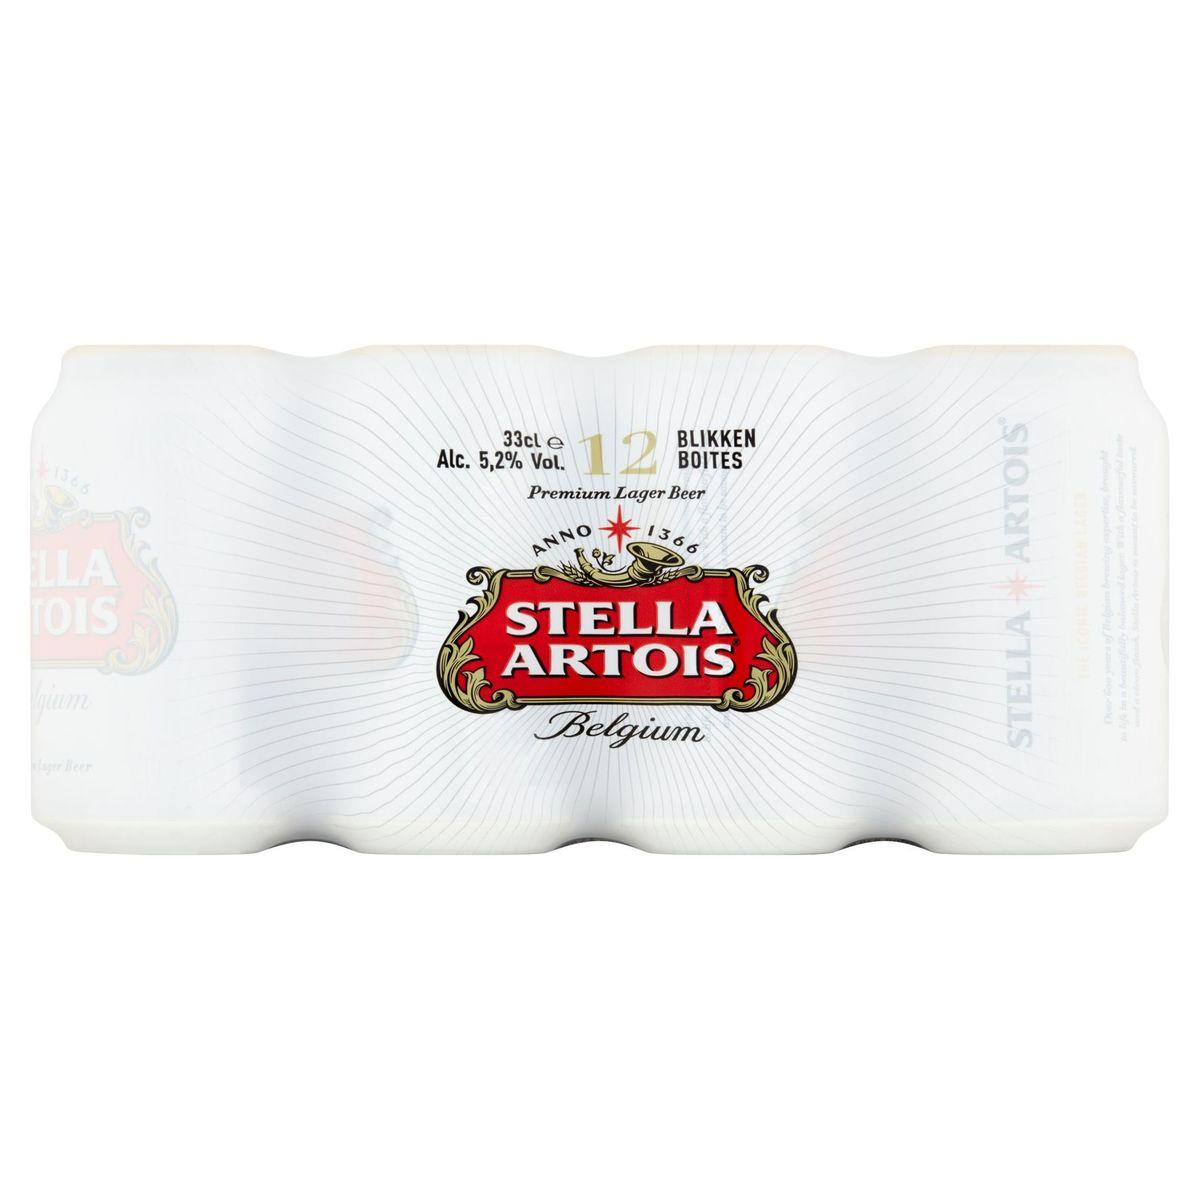 Stella Artois Belgium Premium Lager Beer Blikken 12 x 33 cl